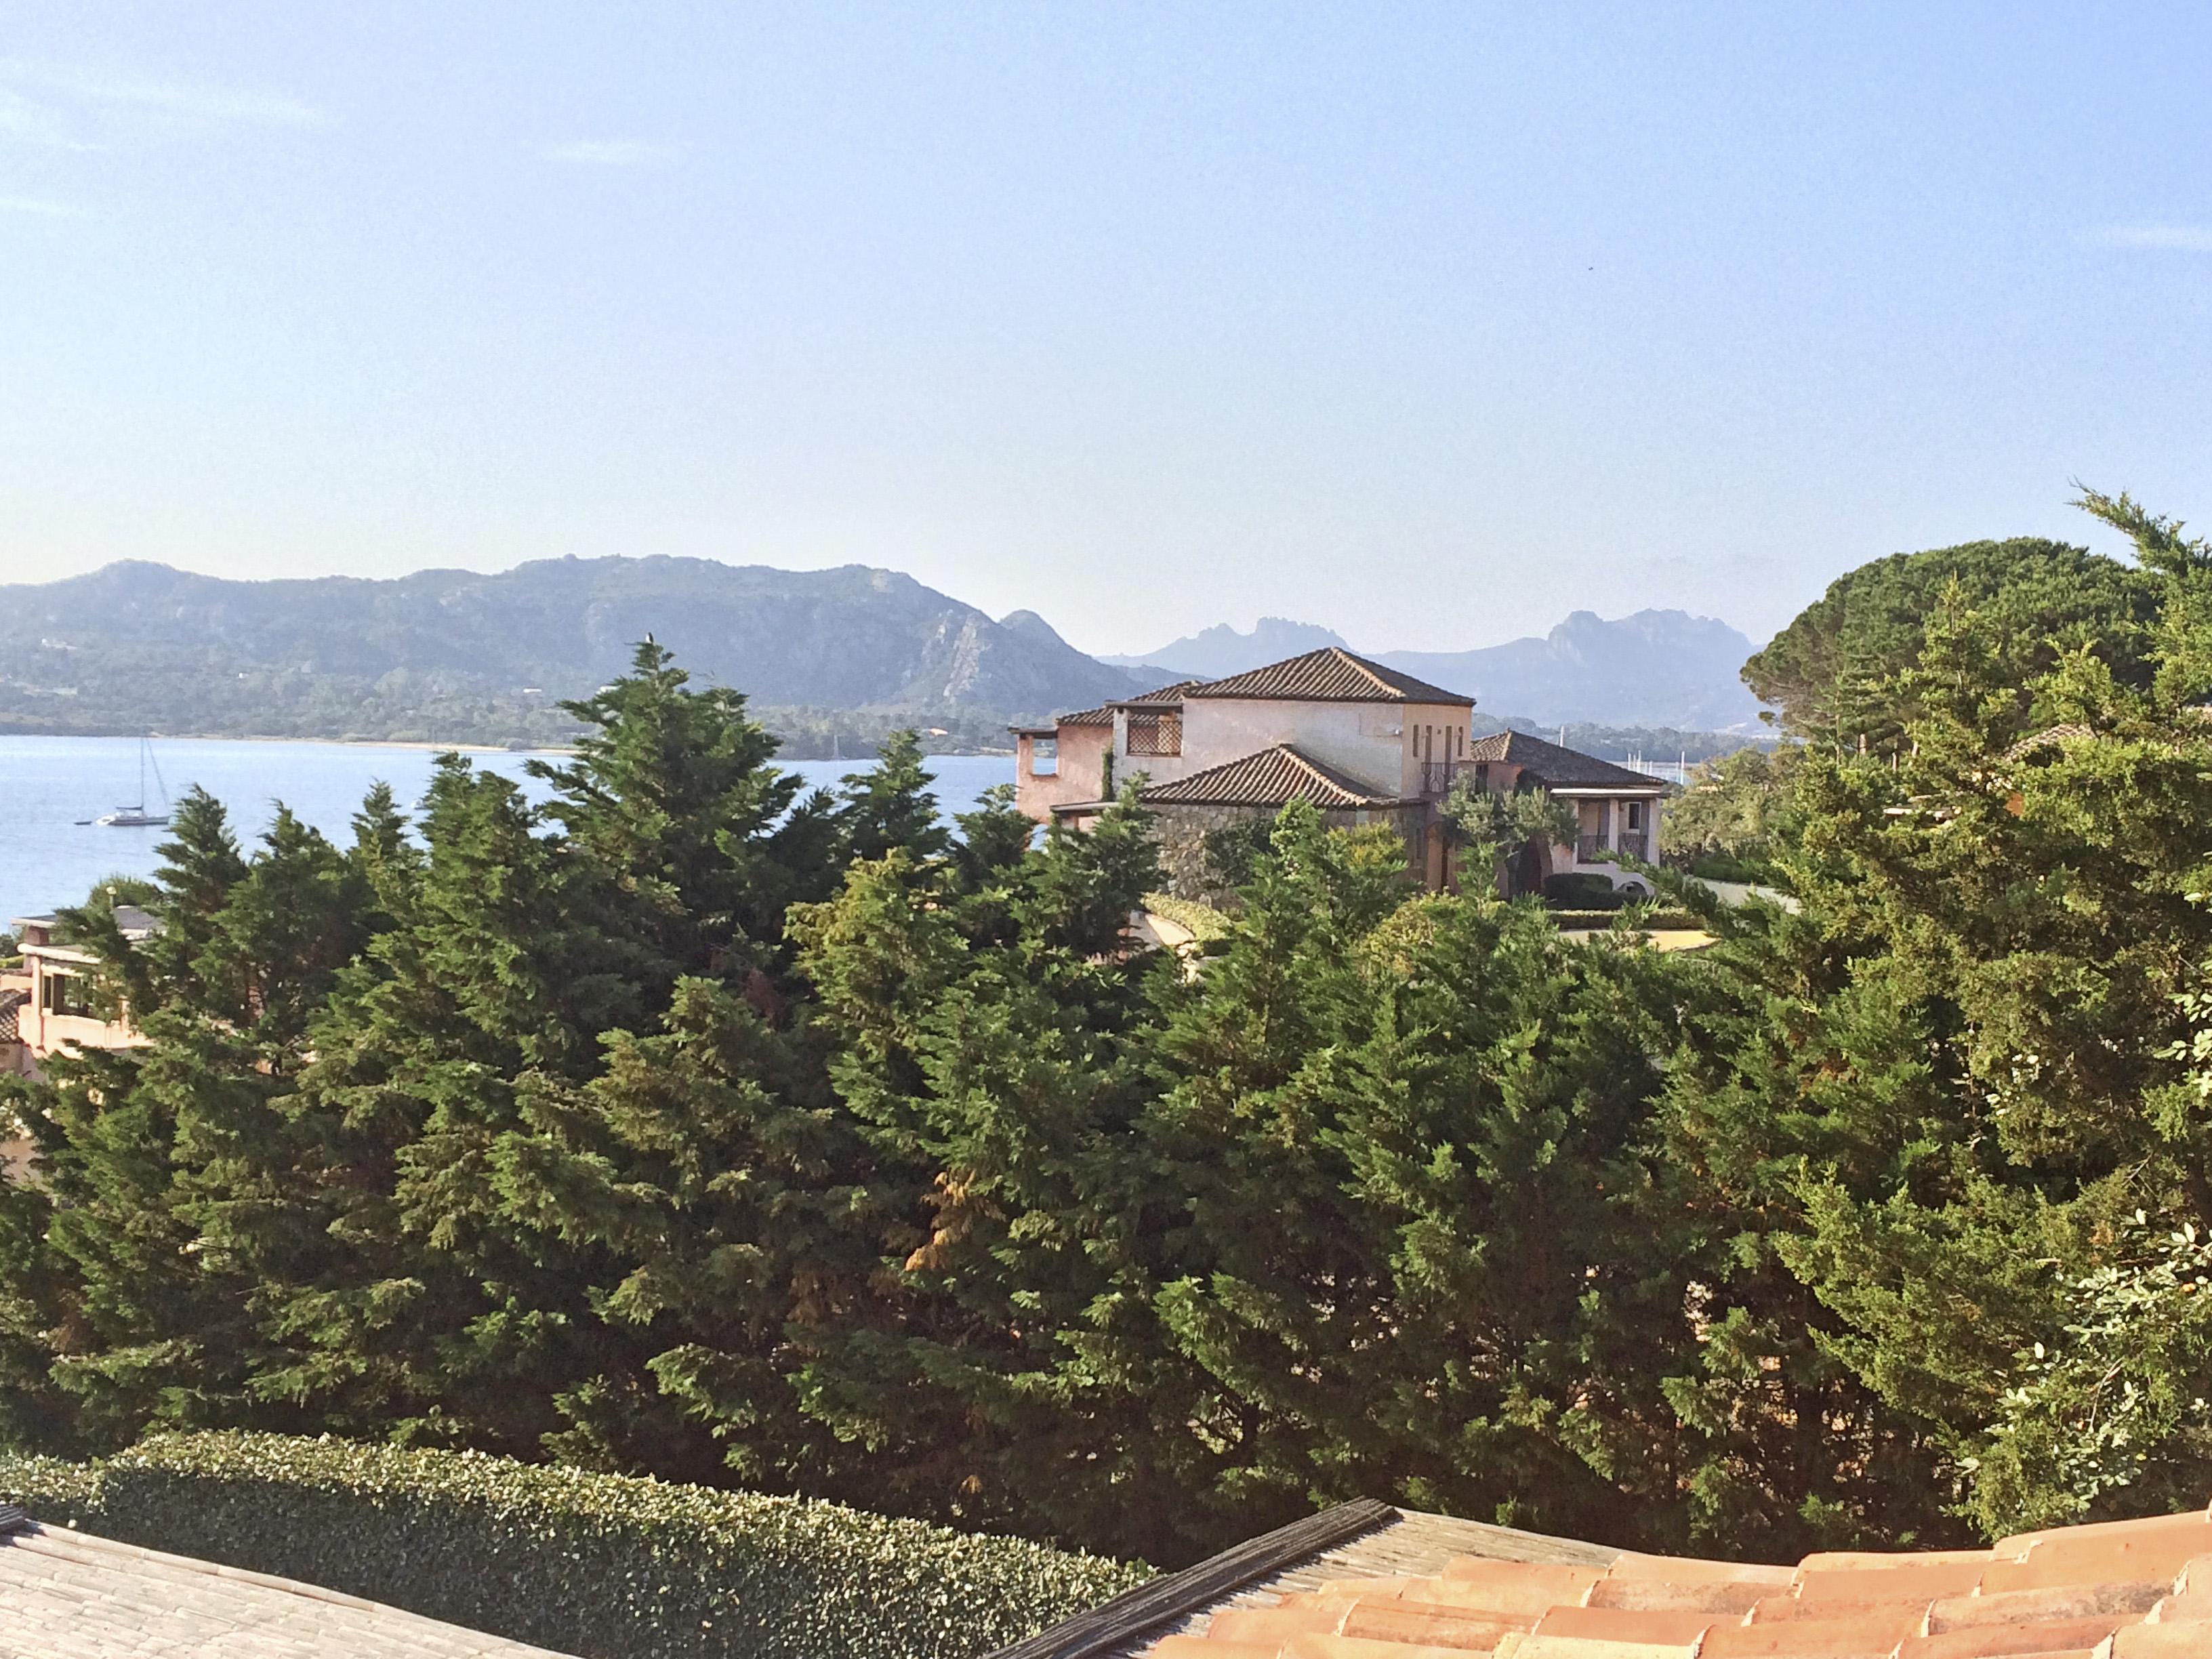 A view from the Villa Del Golfo